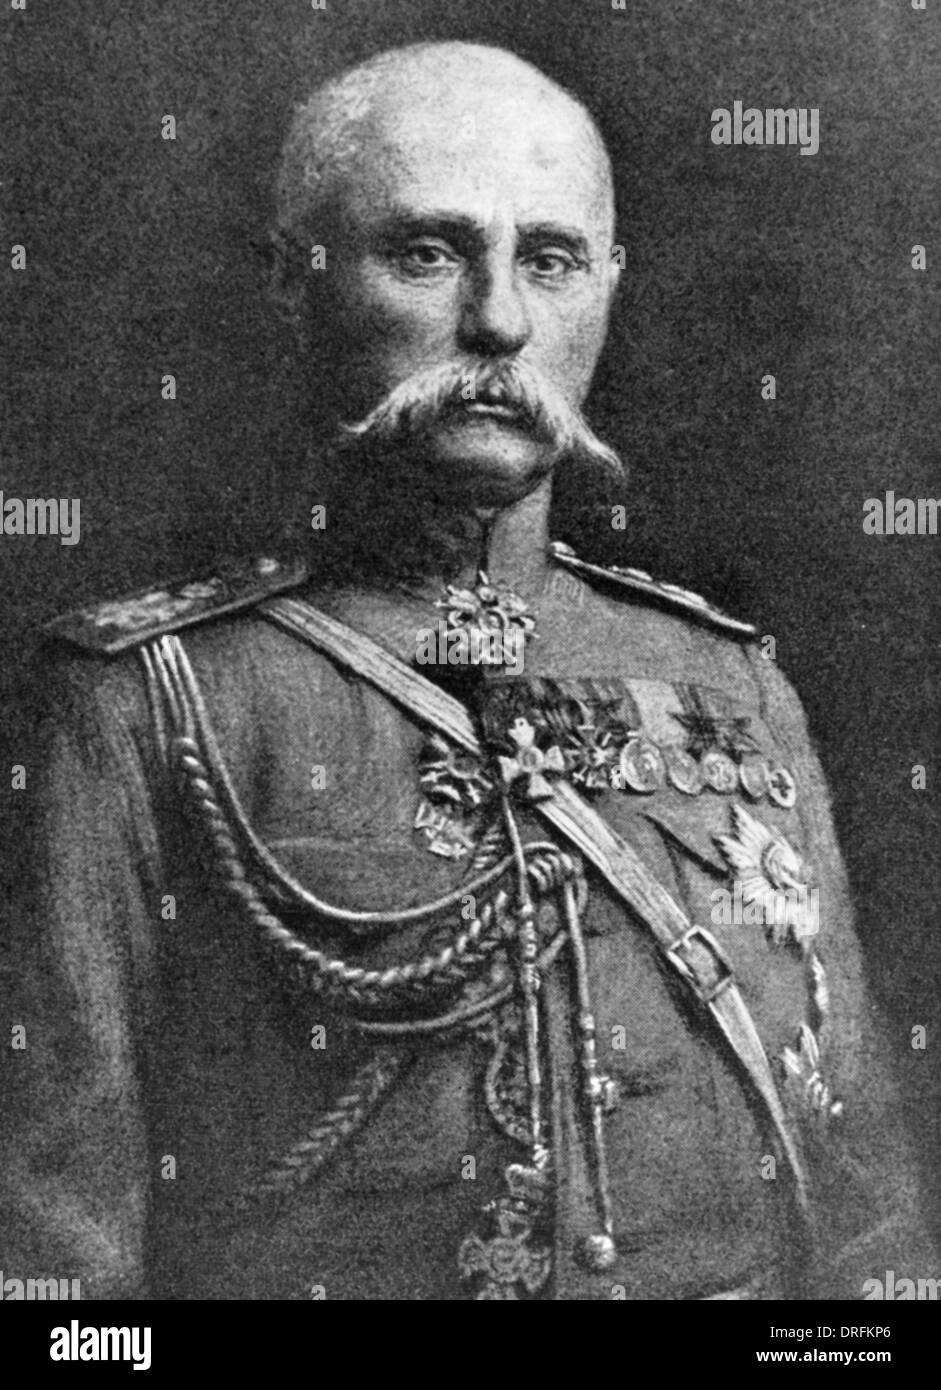 General Lechitski, Russian army officer - Stock Image